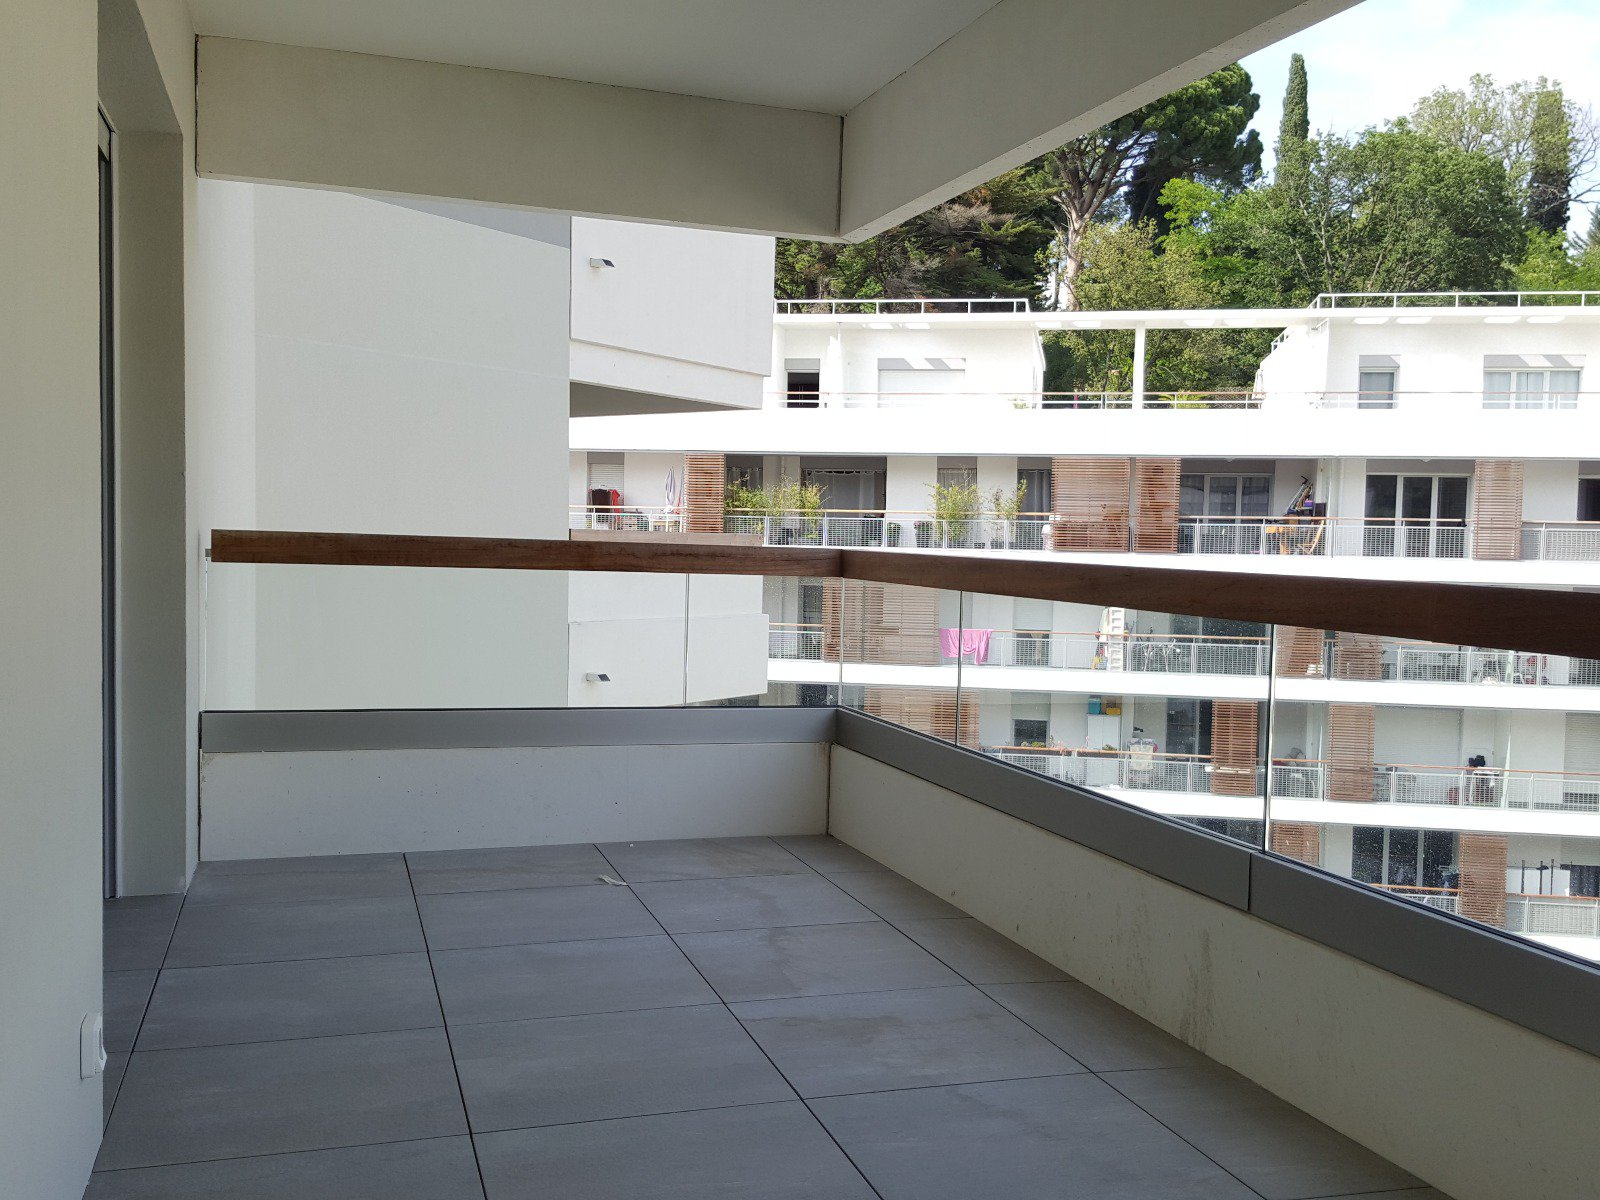 A LOUER - STUDIO NEUF - AVENUE MICHEL JOURDAN - CANNES LA BOCCA 06150